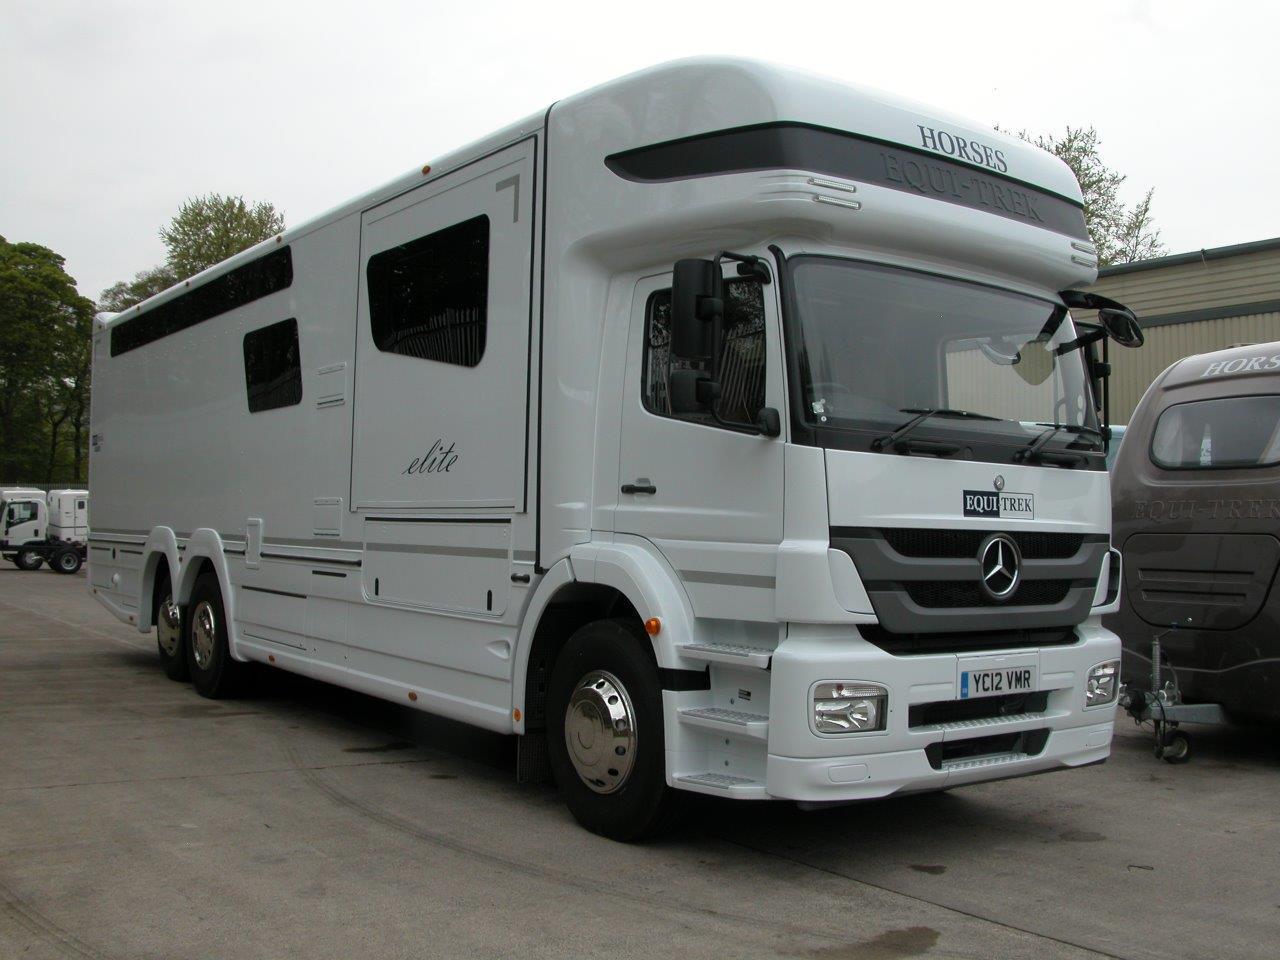 Pre-Owned Equi-Trek Enterprise Elite 26000kg